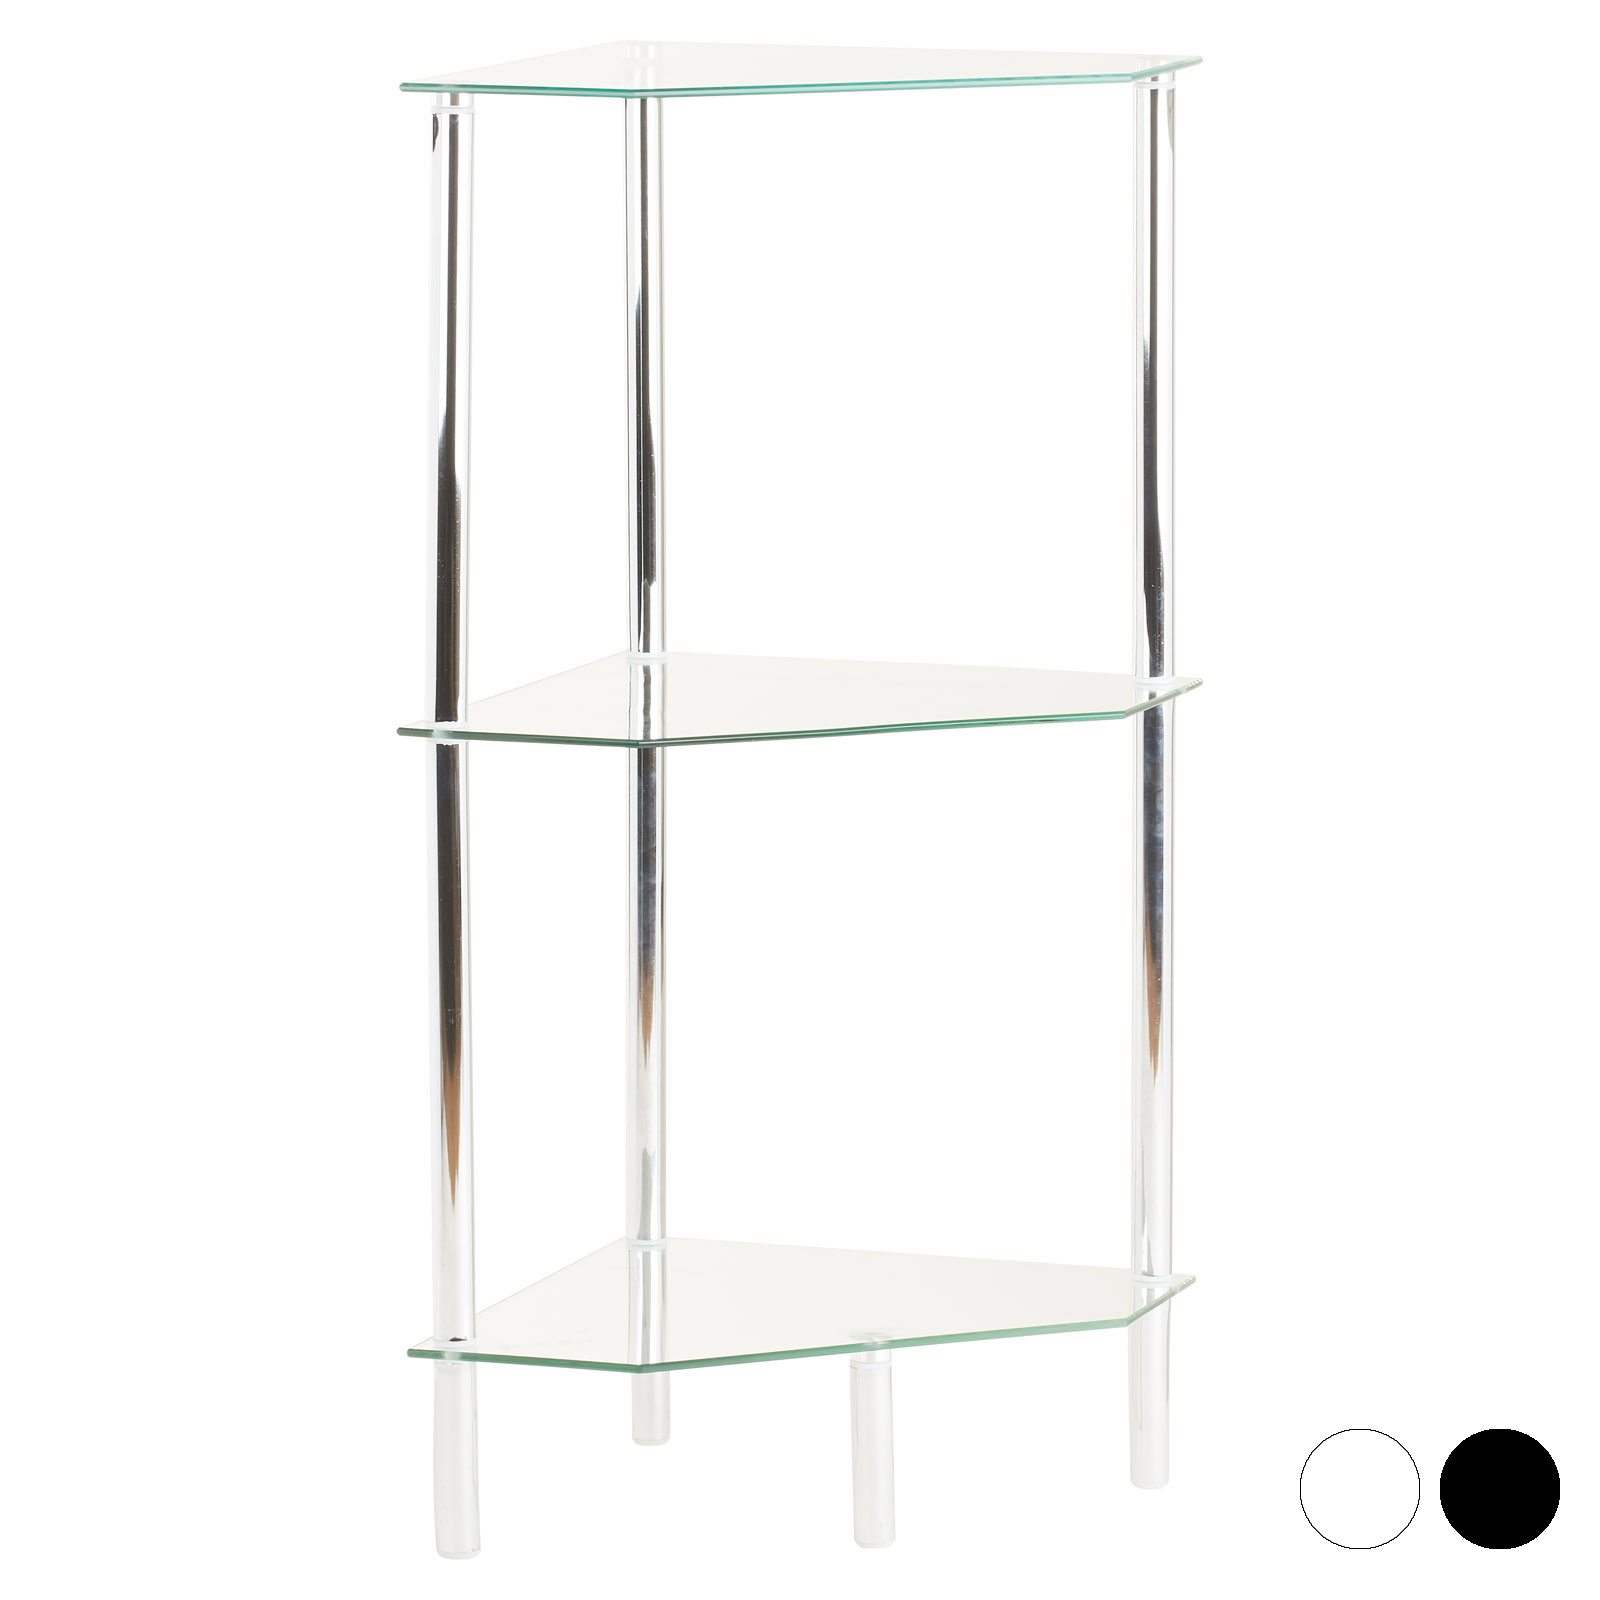 Details About Glass Corner Shelf Shelving Unit Display Bathroom Hall End Lamp Table Storage